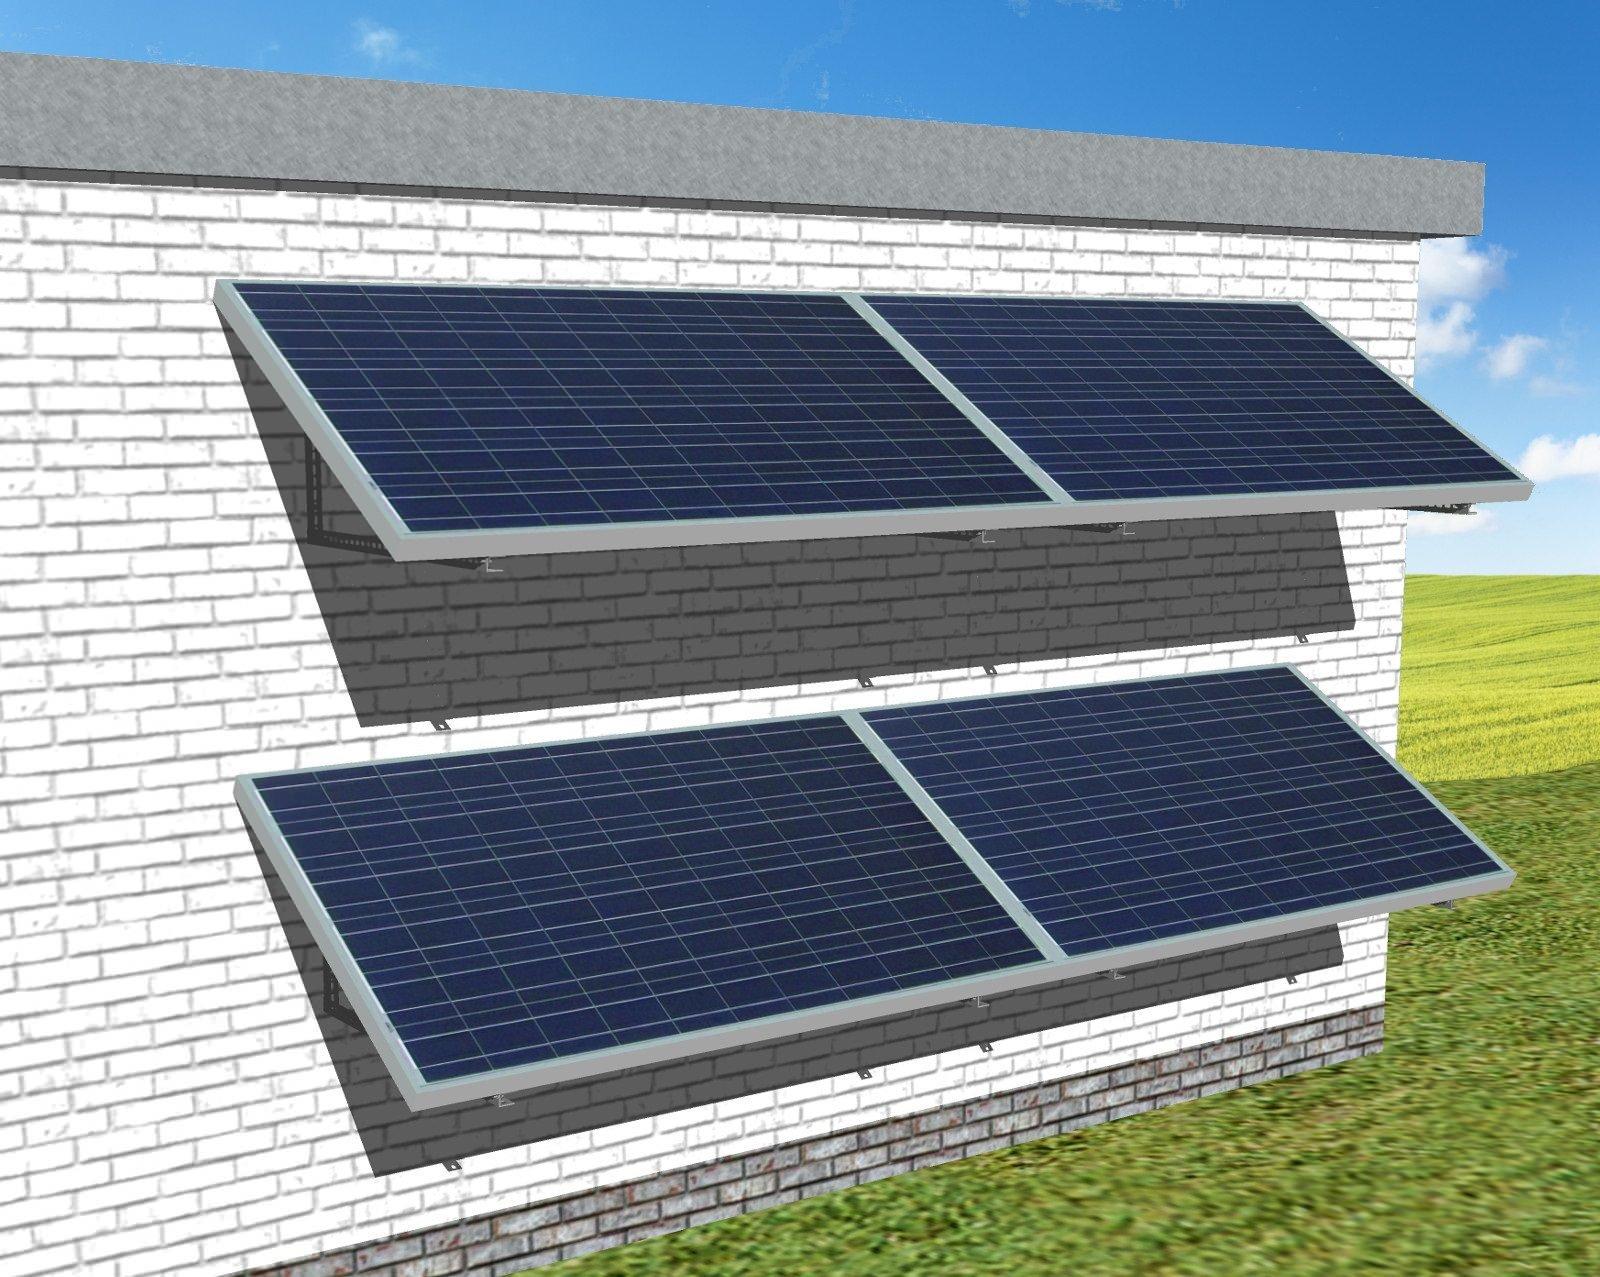 myCleantech-Solar.org Solaranalage Fassade oder Carport mit 4 Pannels